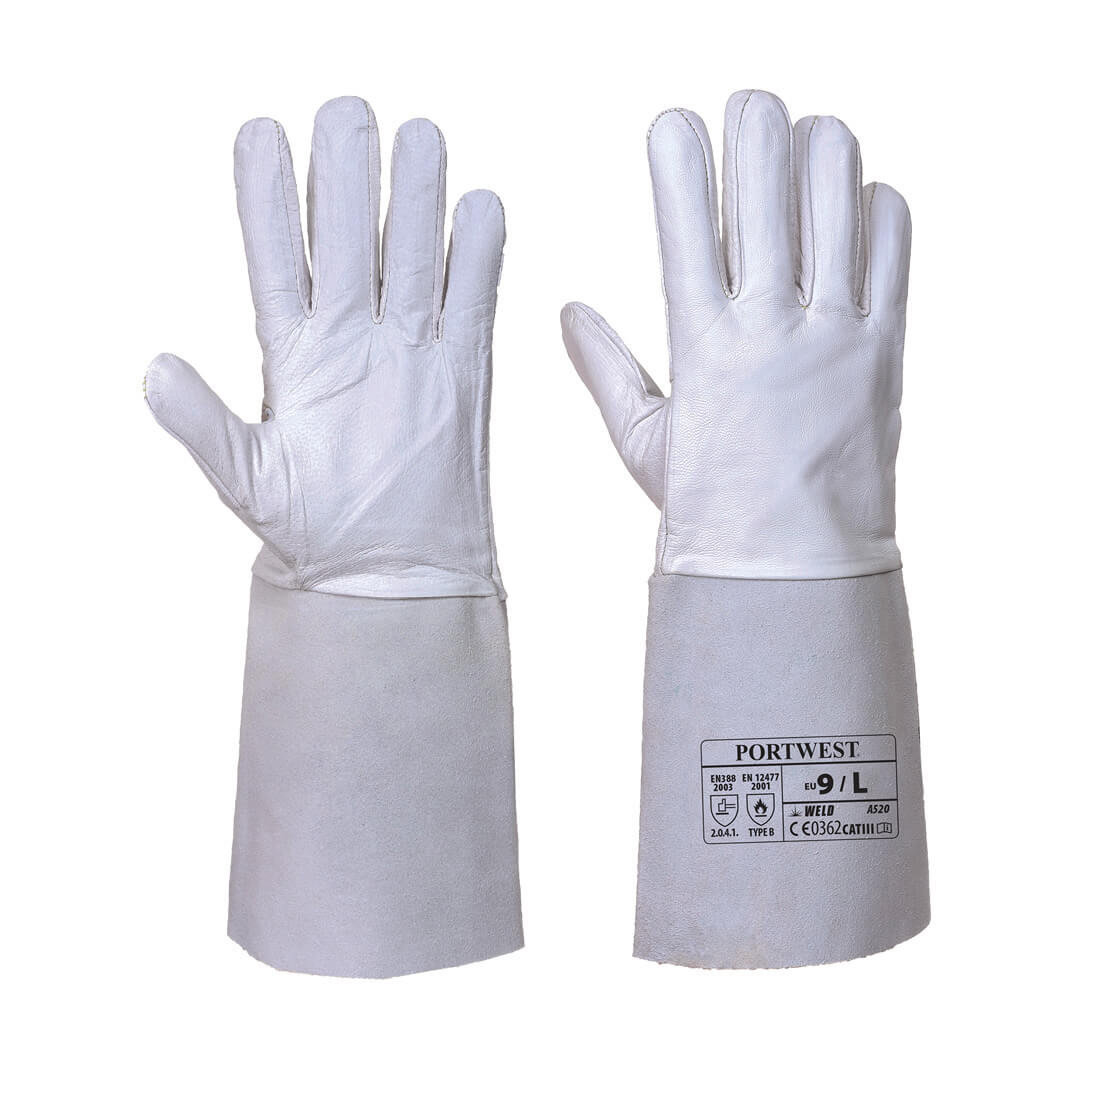 Manusa Premium Tig Welding - Echipamente de protectie personala